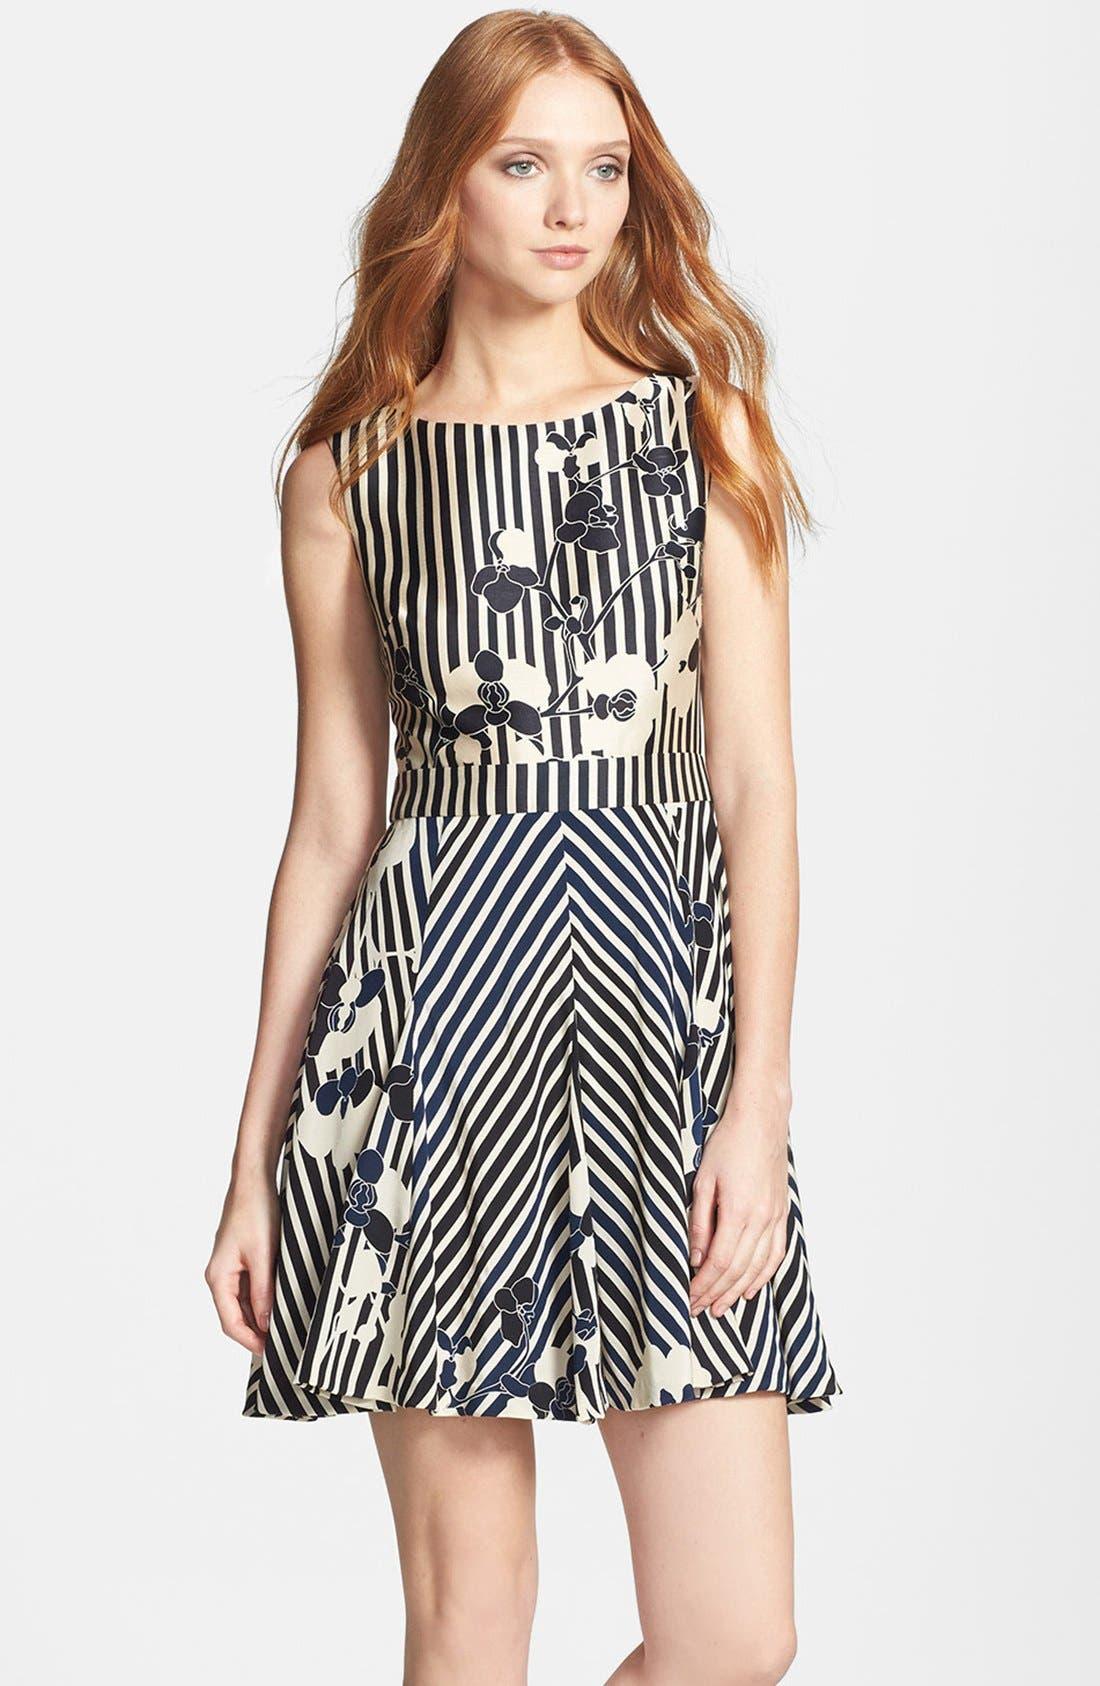 Alternate Image 1 Selected - Diane von Furstenberg 'Kiman' Print Wool Blend A-Line Dress